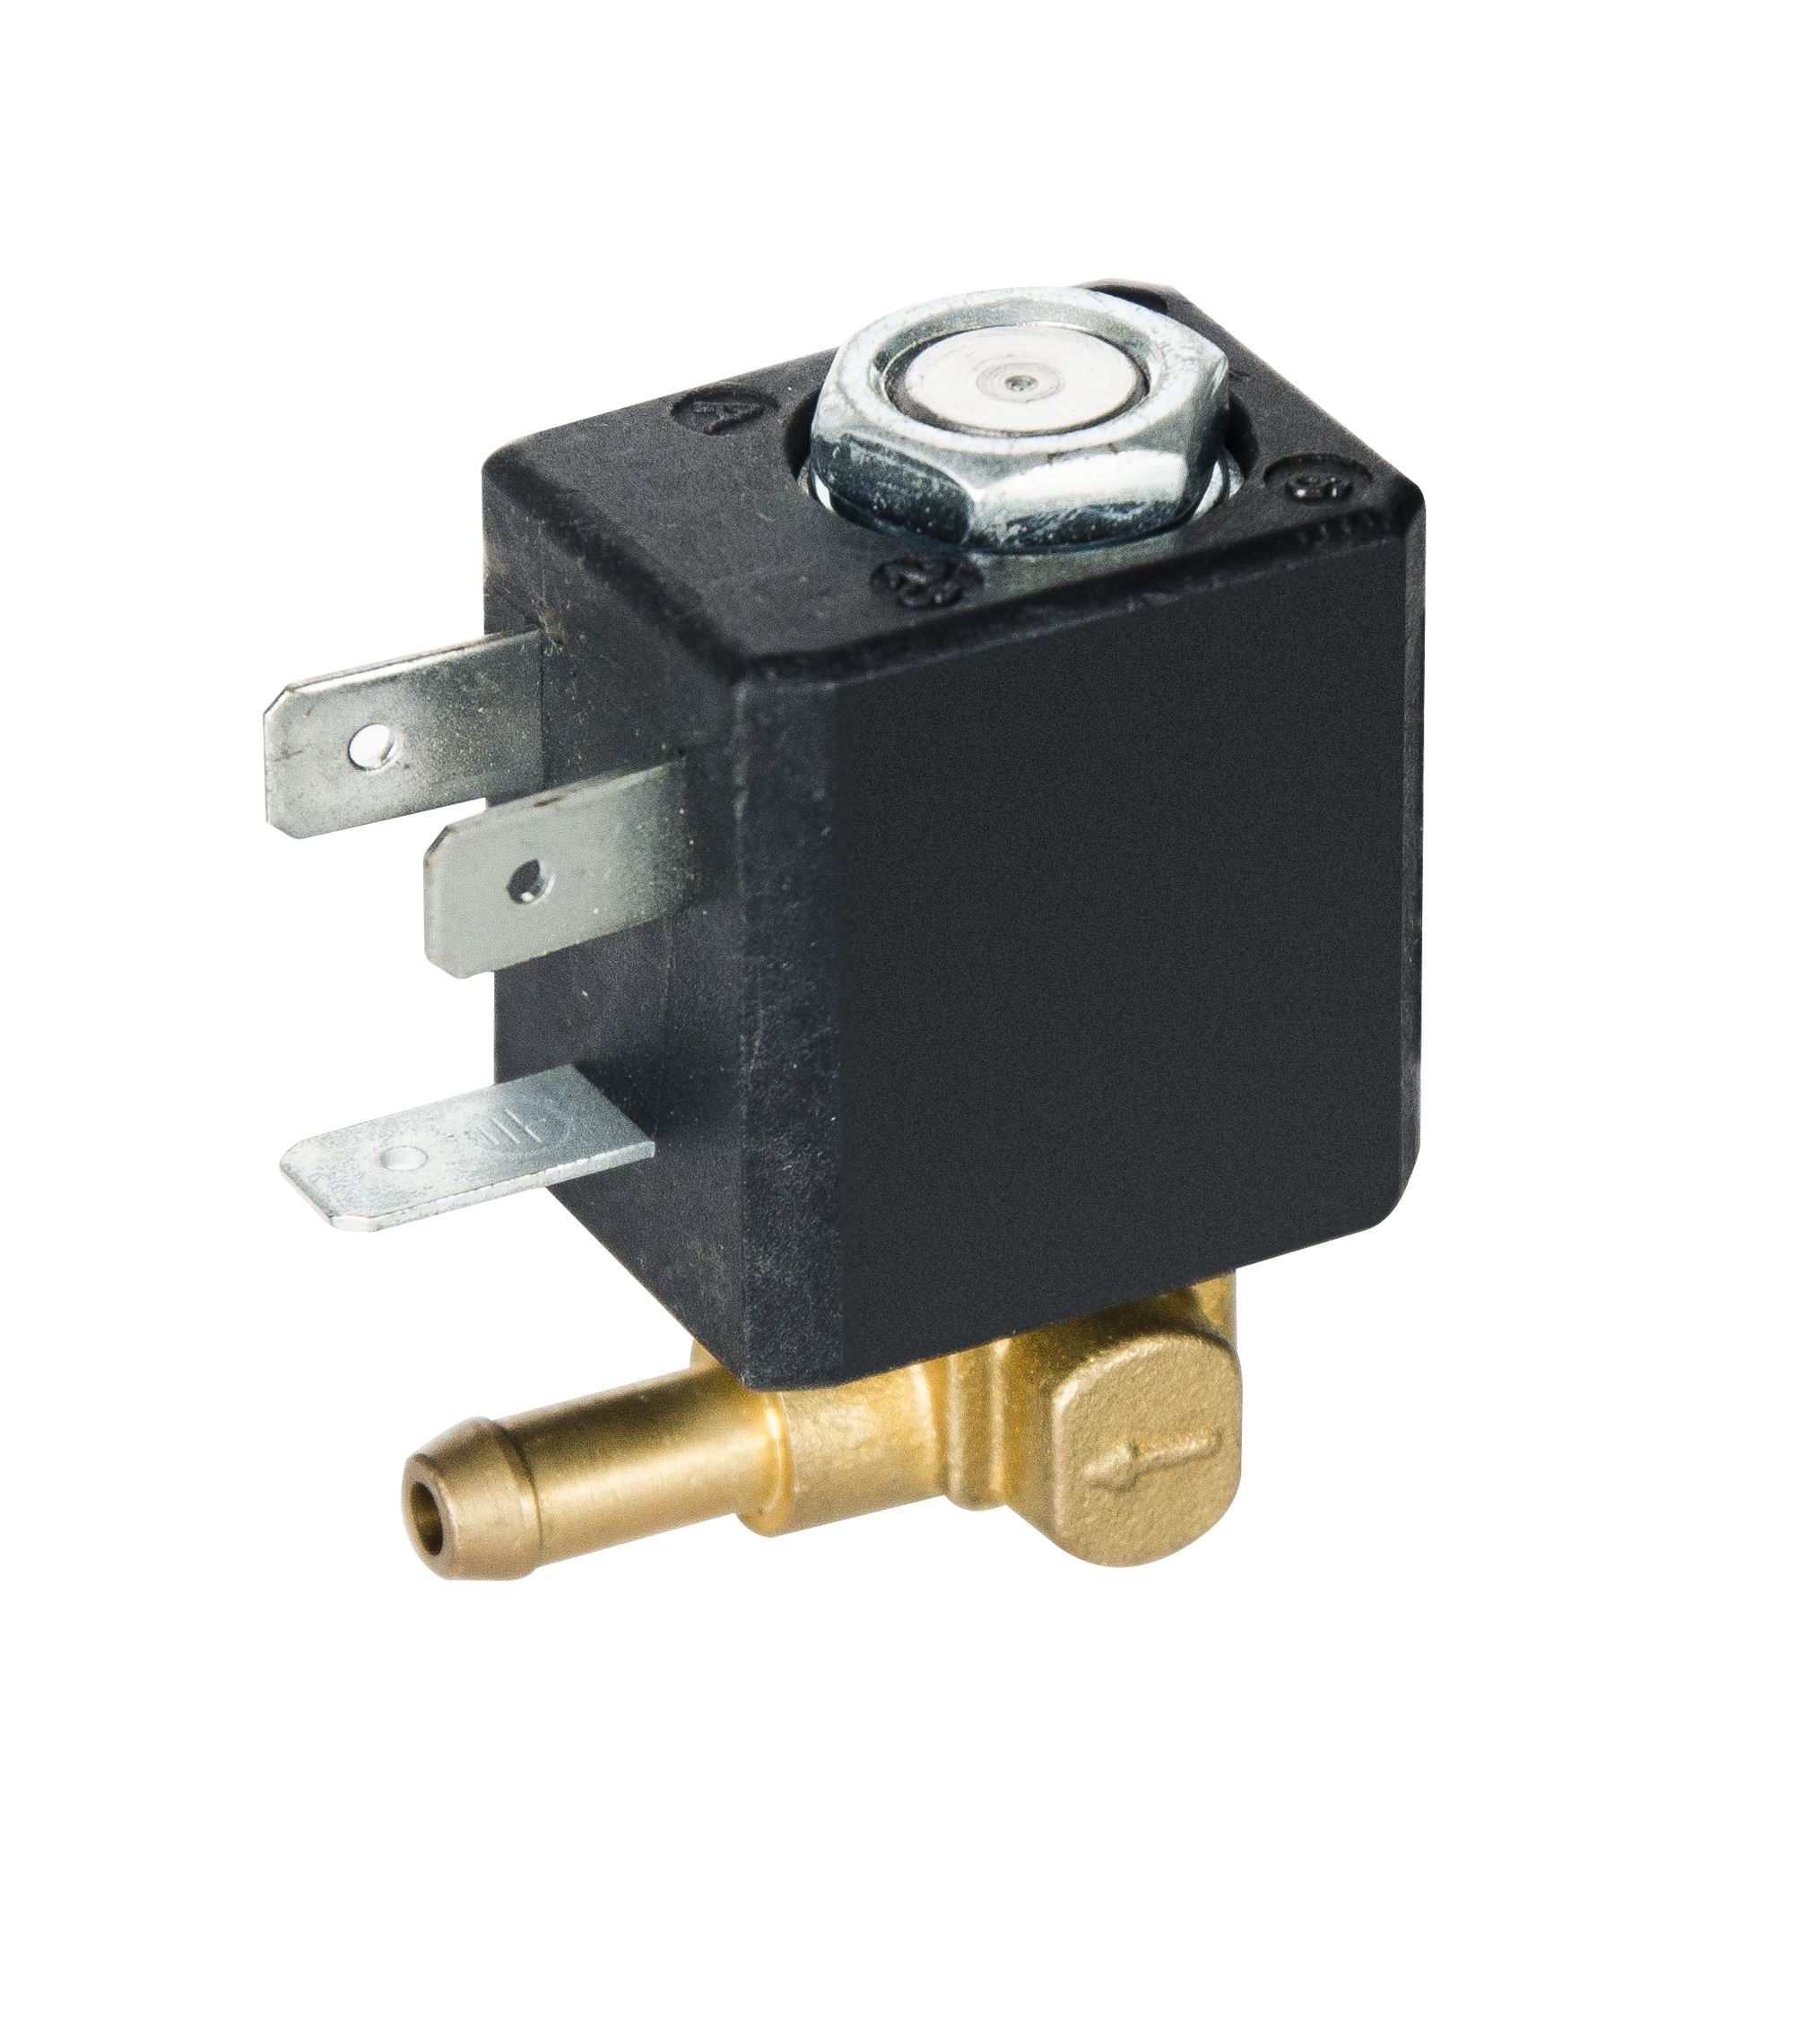 Steam Solenoid Valve Is Developed To Withstand High Temperature Fluids Boiler Solenoid Valve Is Easy To Operate Steam Valve F Steam Valve Valve Machine Design